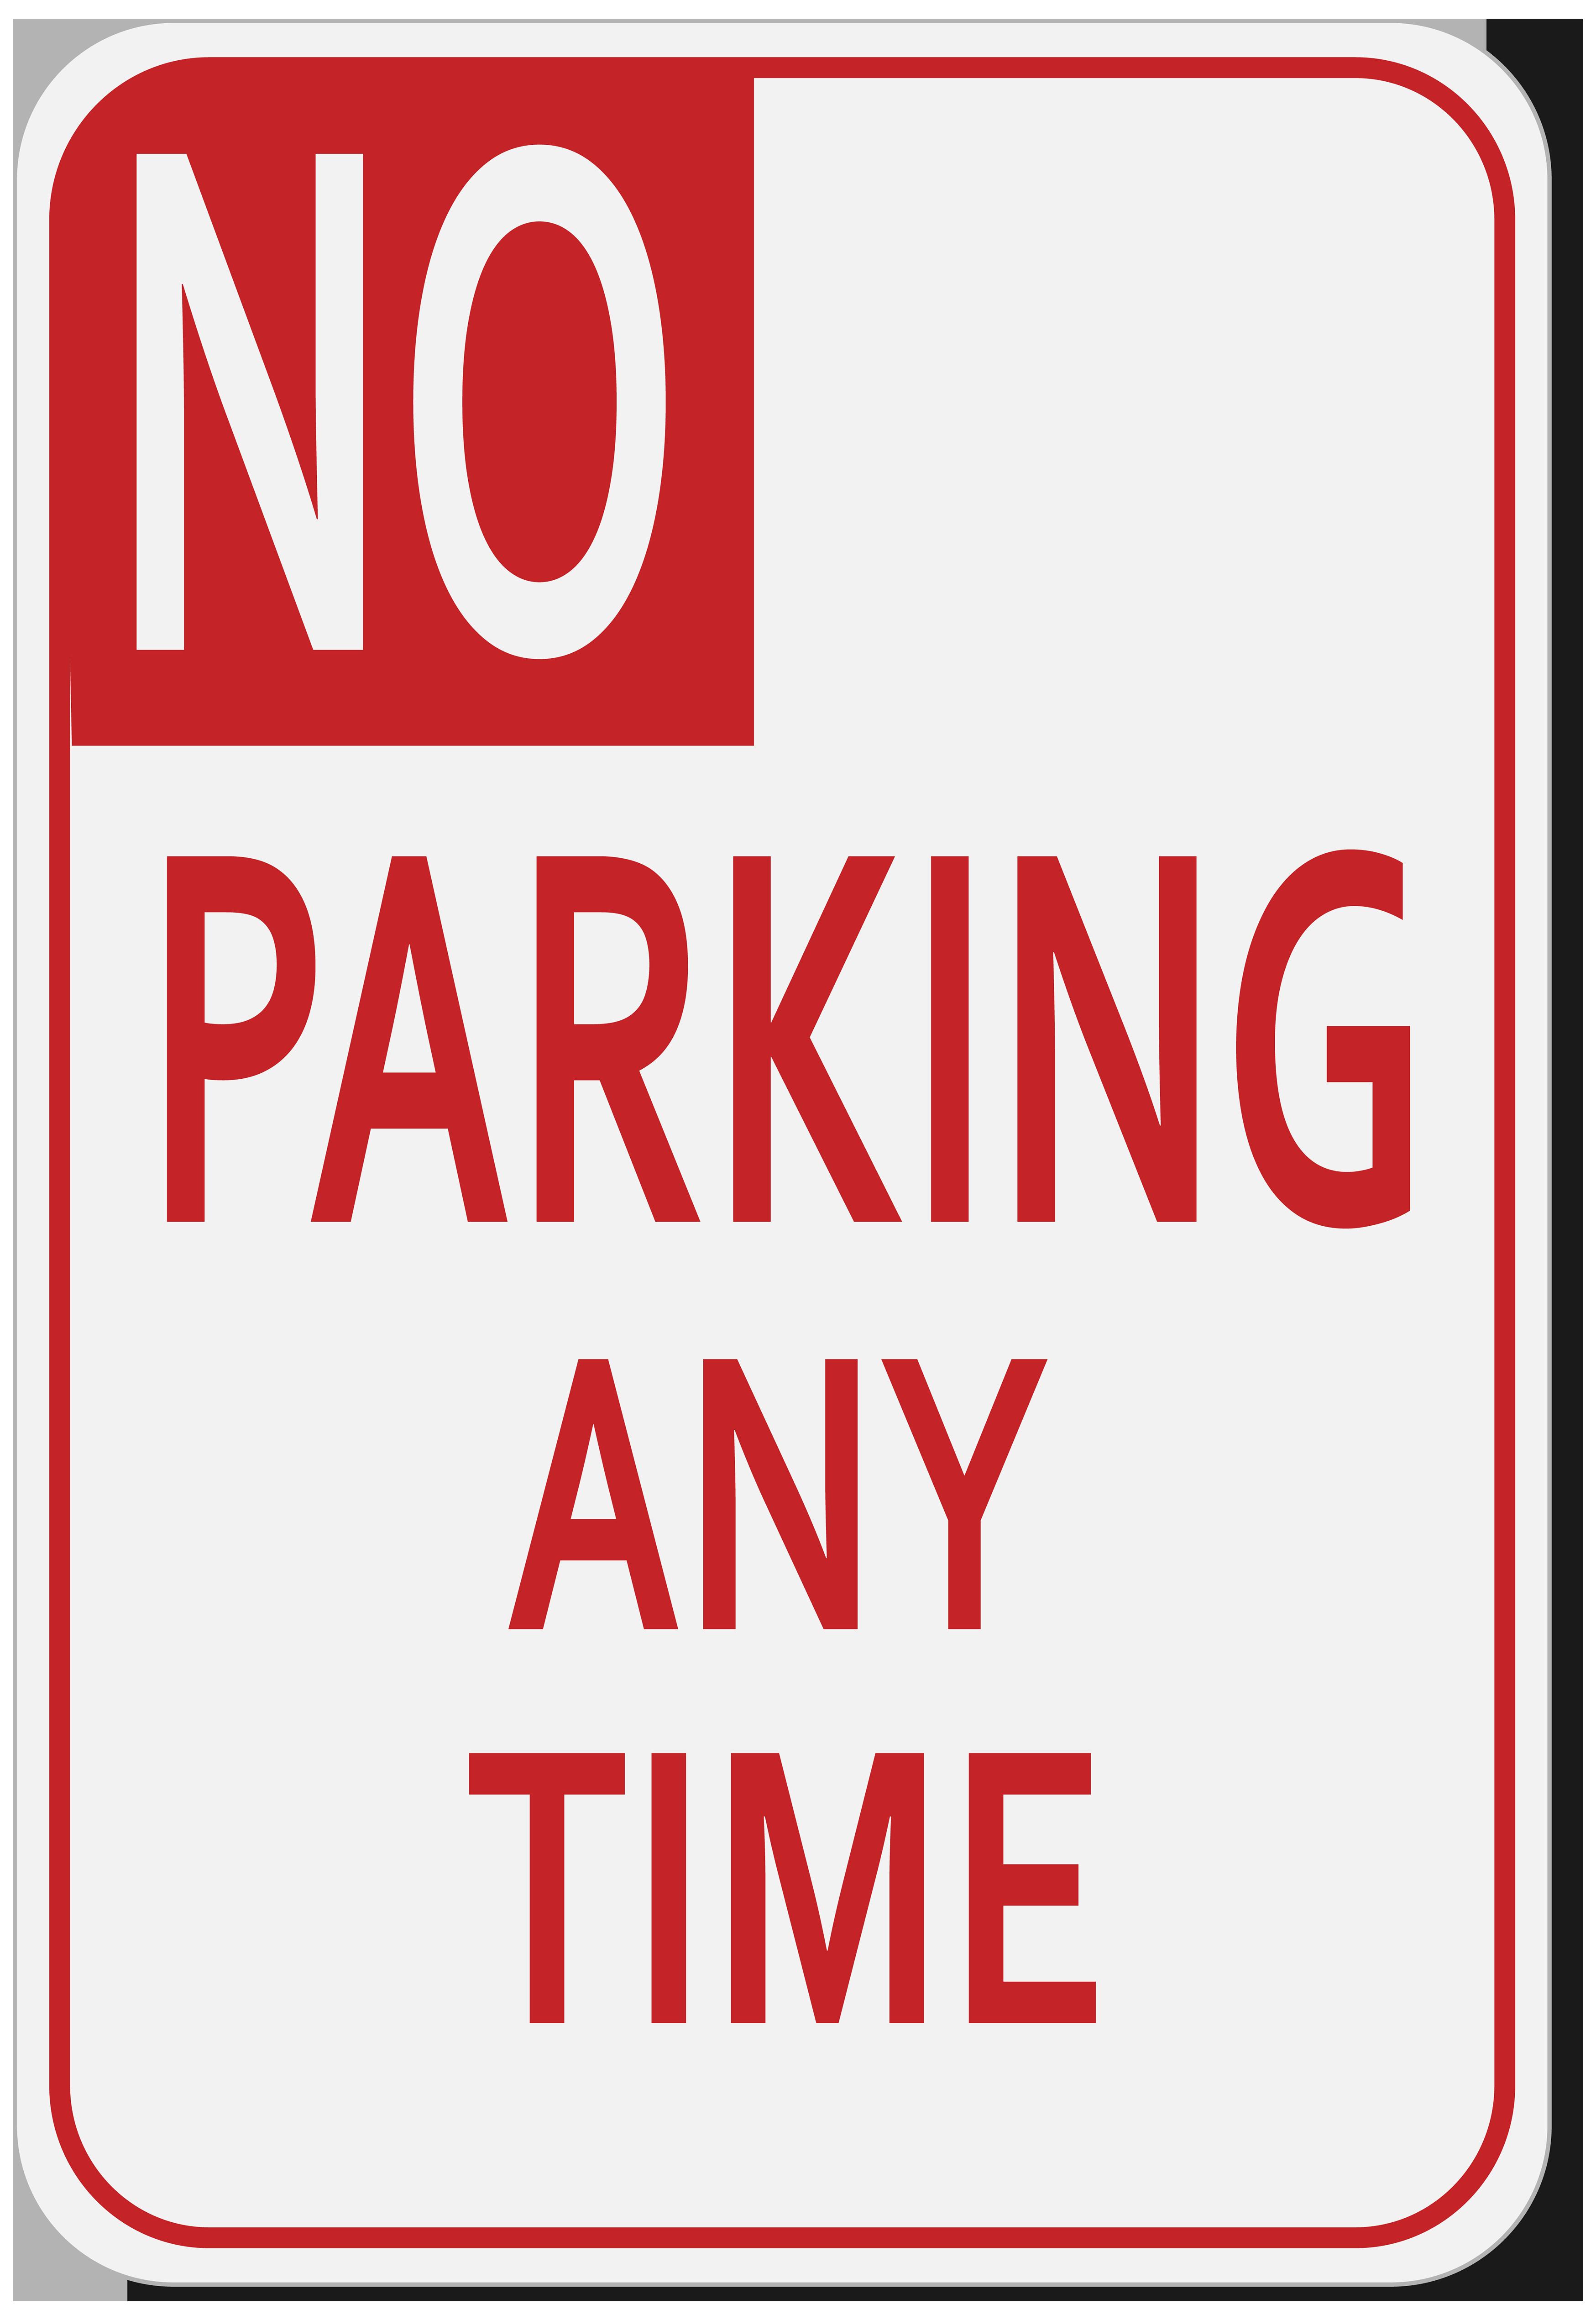 No parking sign cliparts.